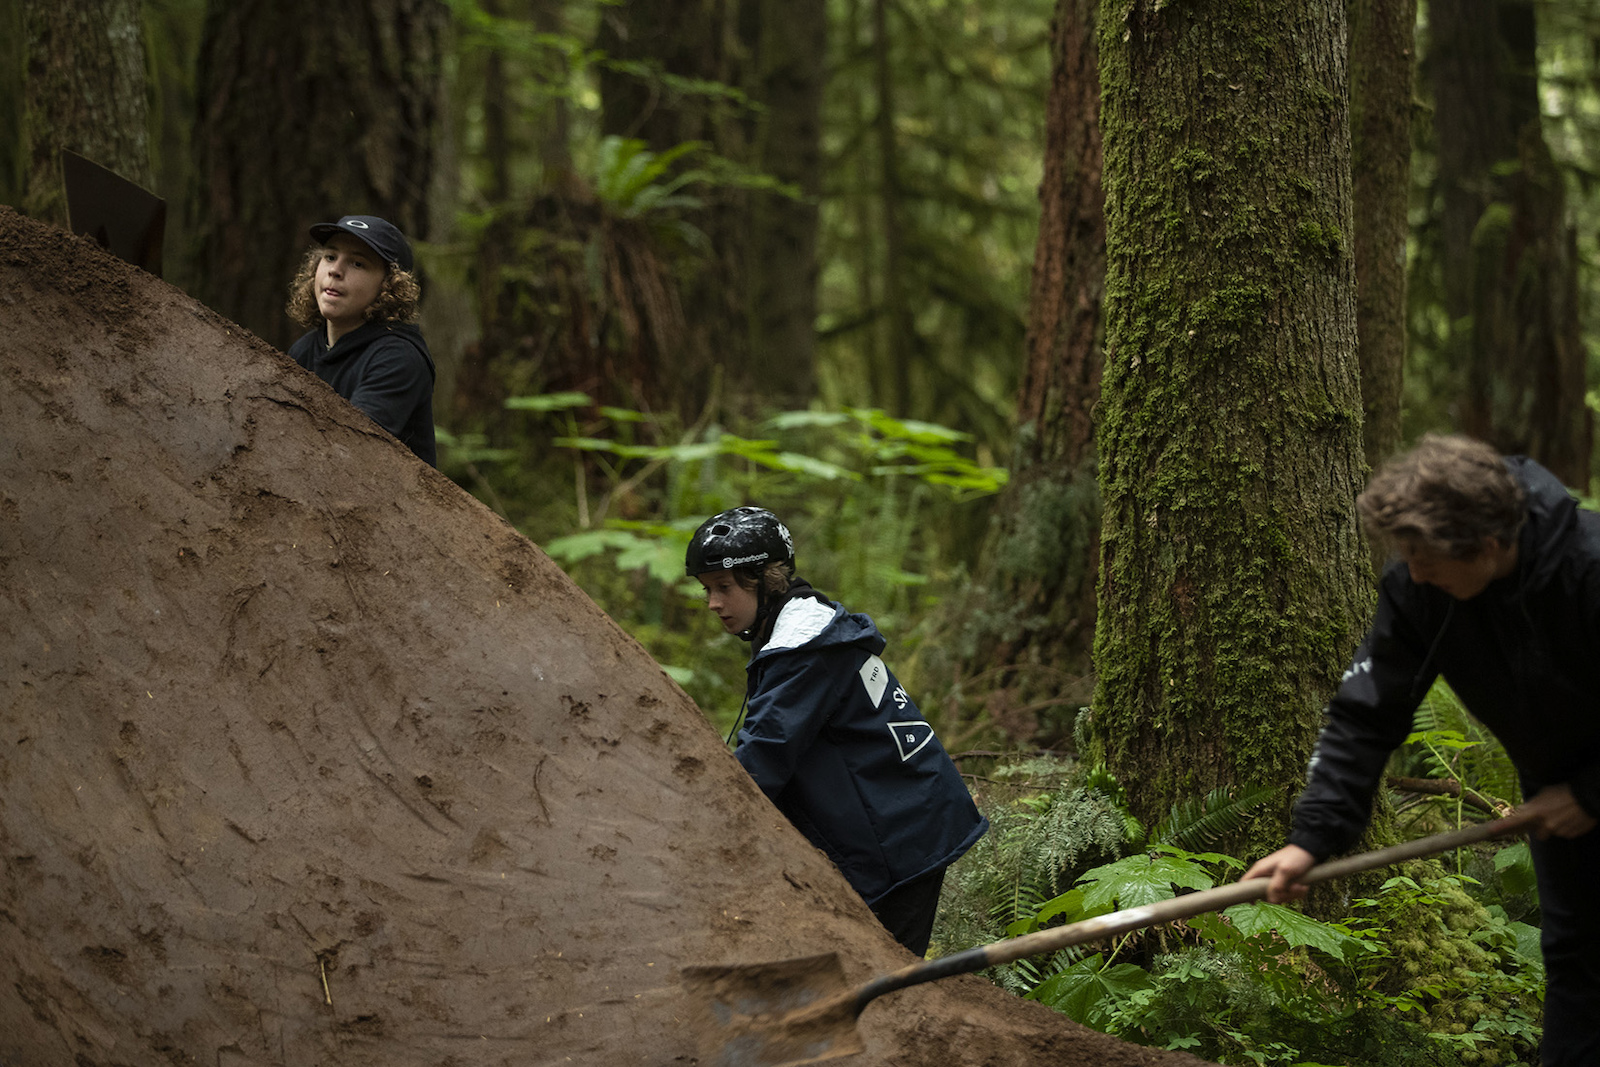 Jackson Goldstone with Jakob and Dane Jewett in Squamish British Columbia Canada